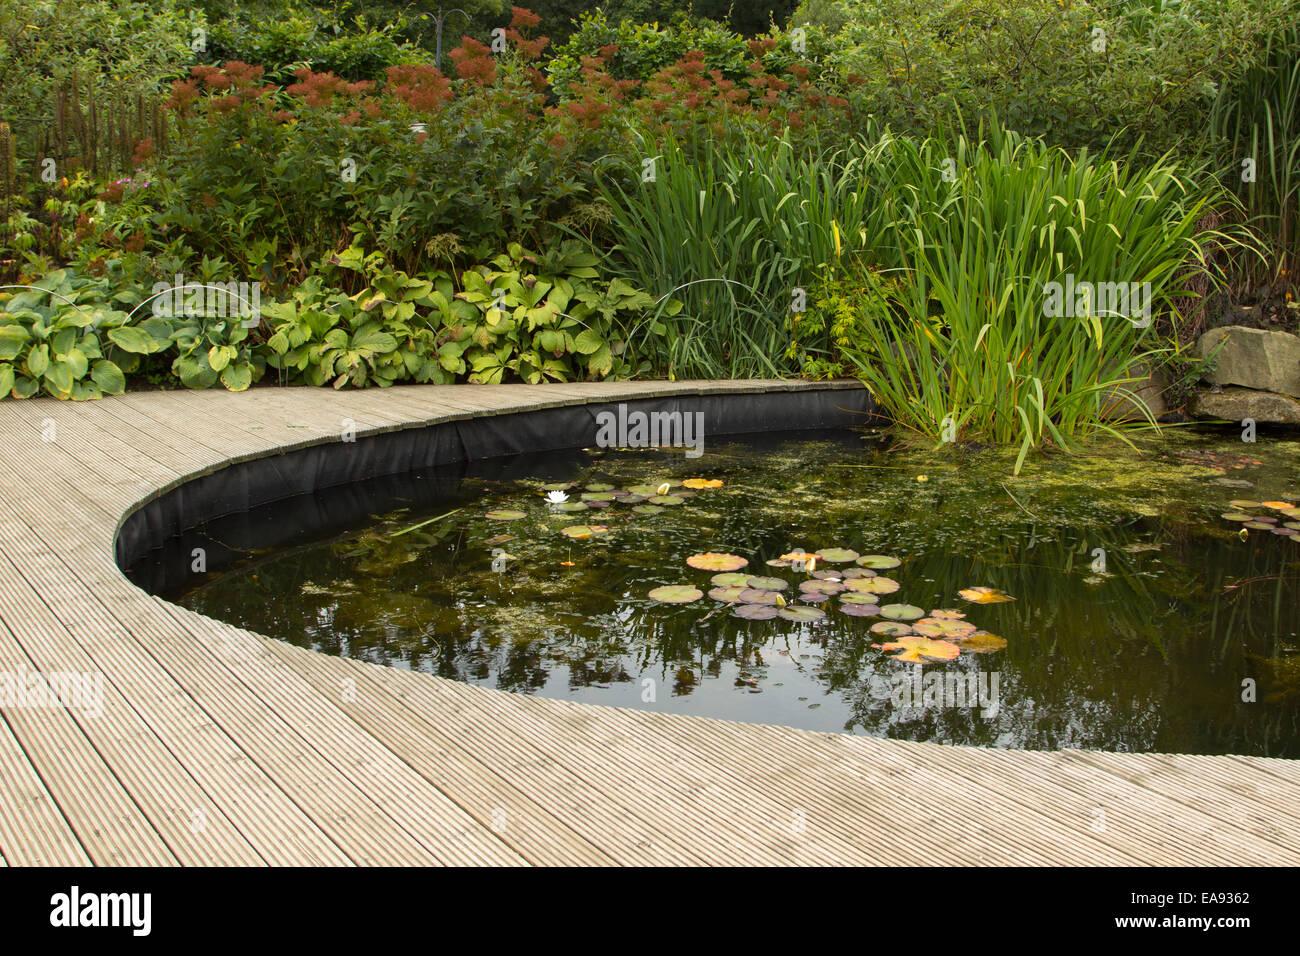 Garden pond and decking in garden stock photo royalty for Garden decking with pond